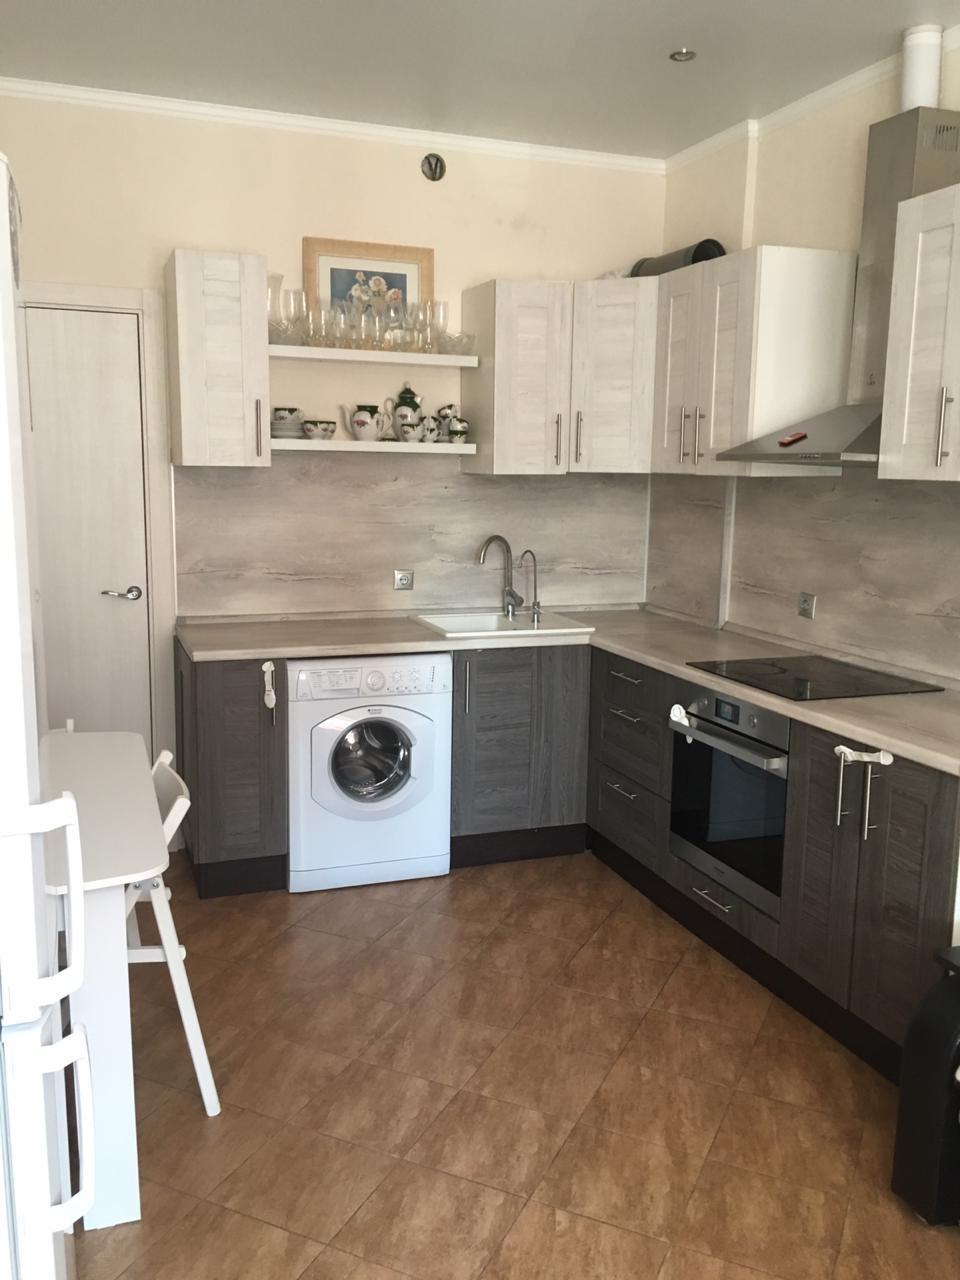 Квартира, 1 комната, 47 м² в Коммунарке 89055769697 купить 6